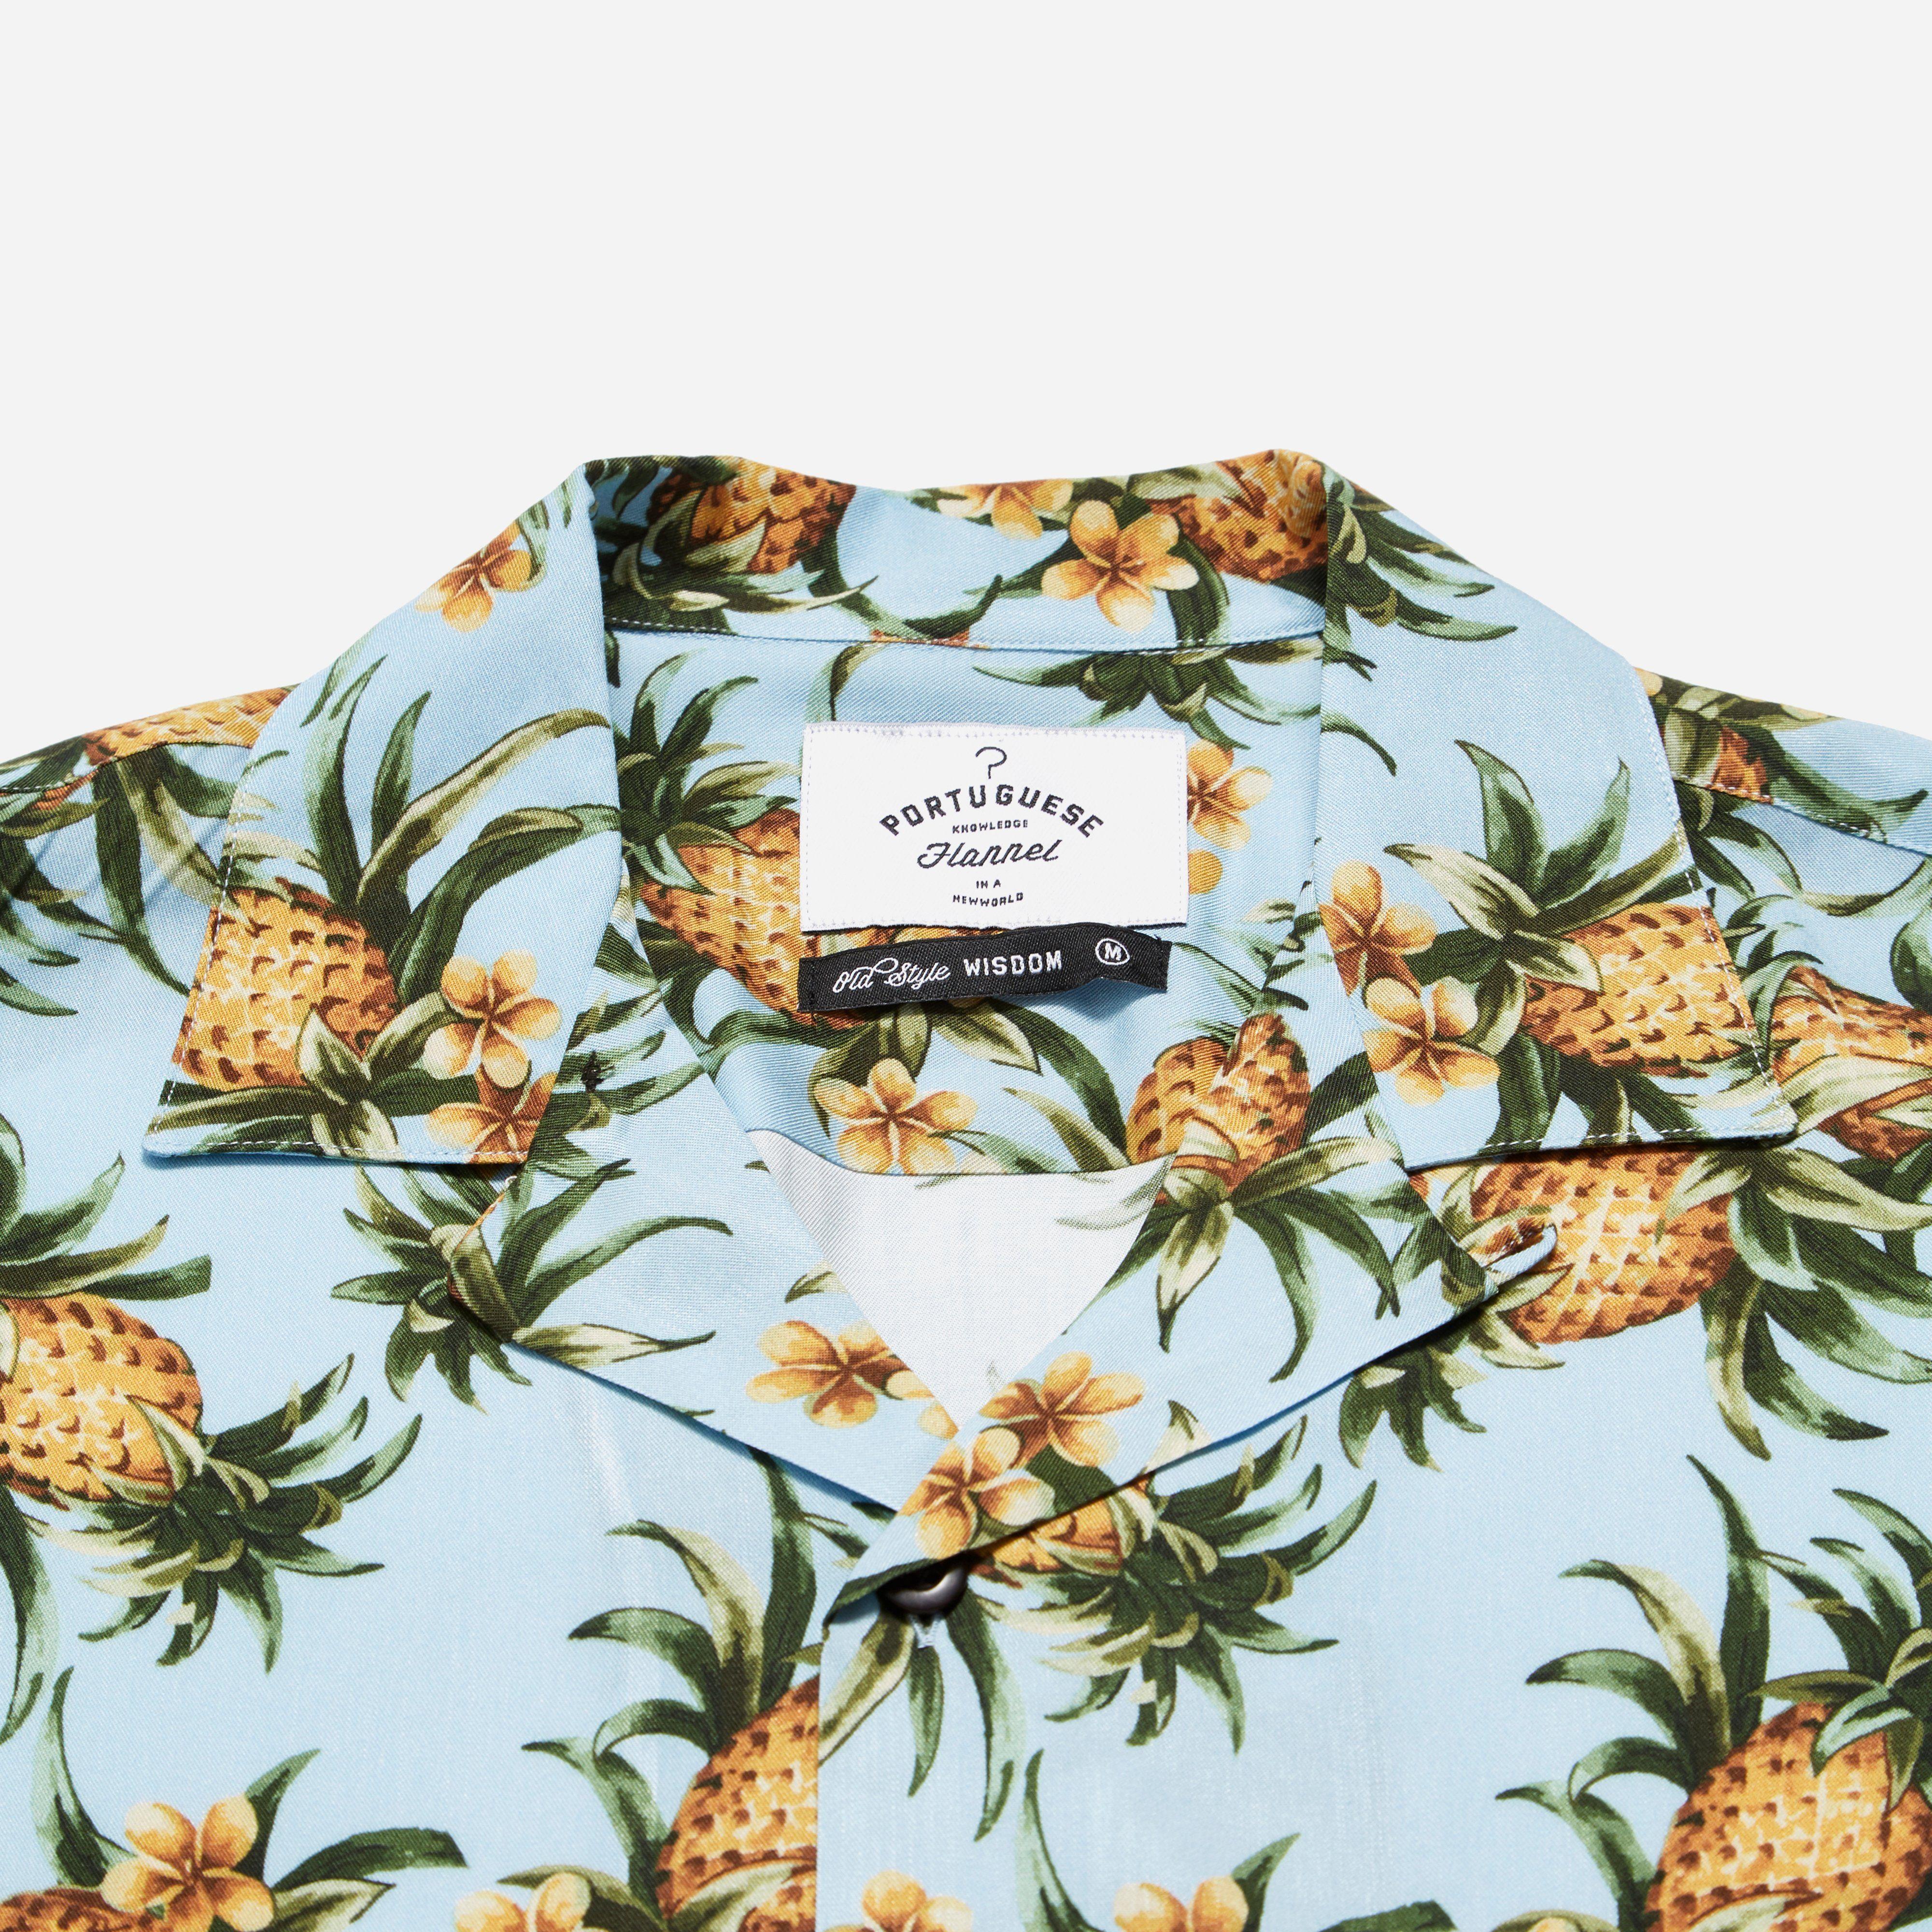 Portuguese Flannel Ananas Shirt